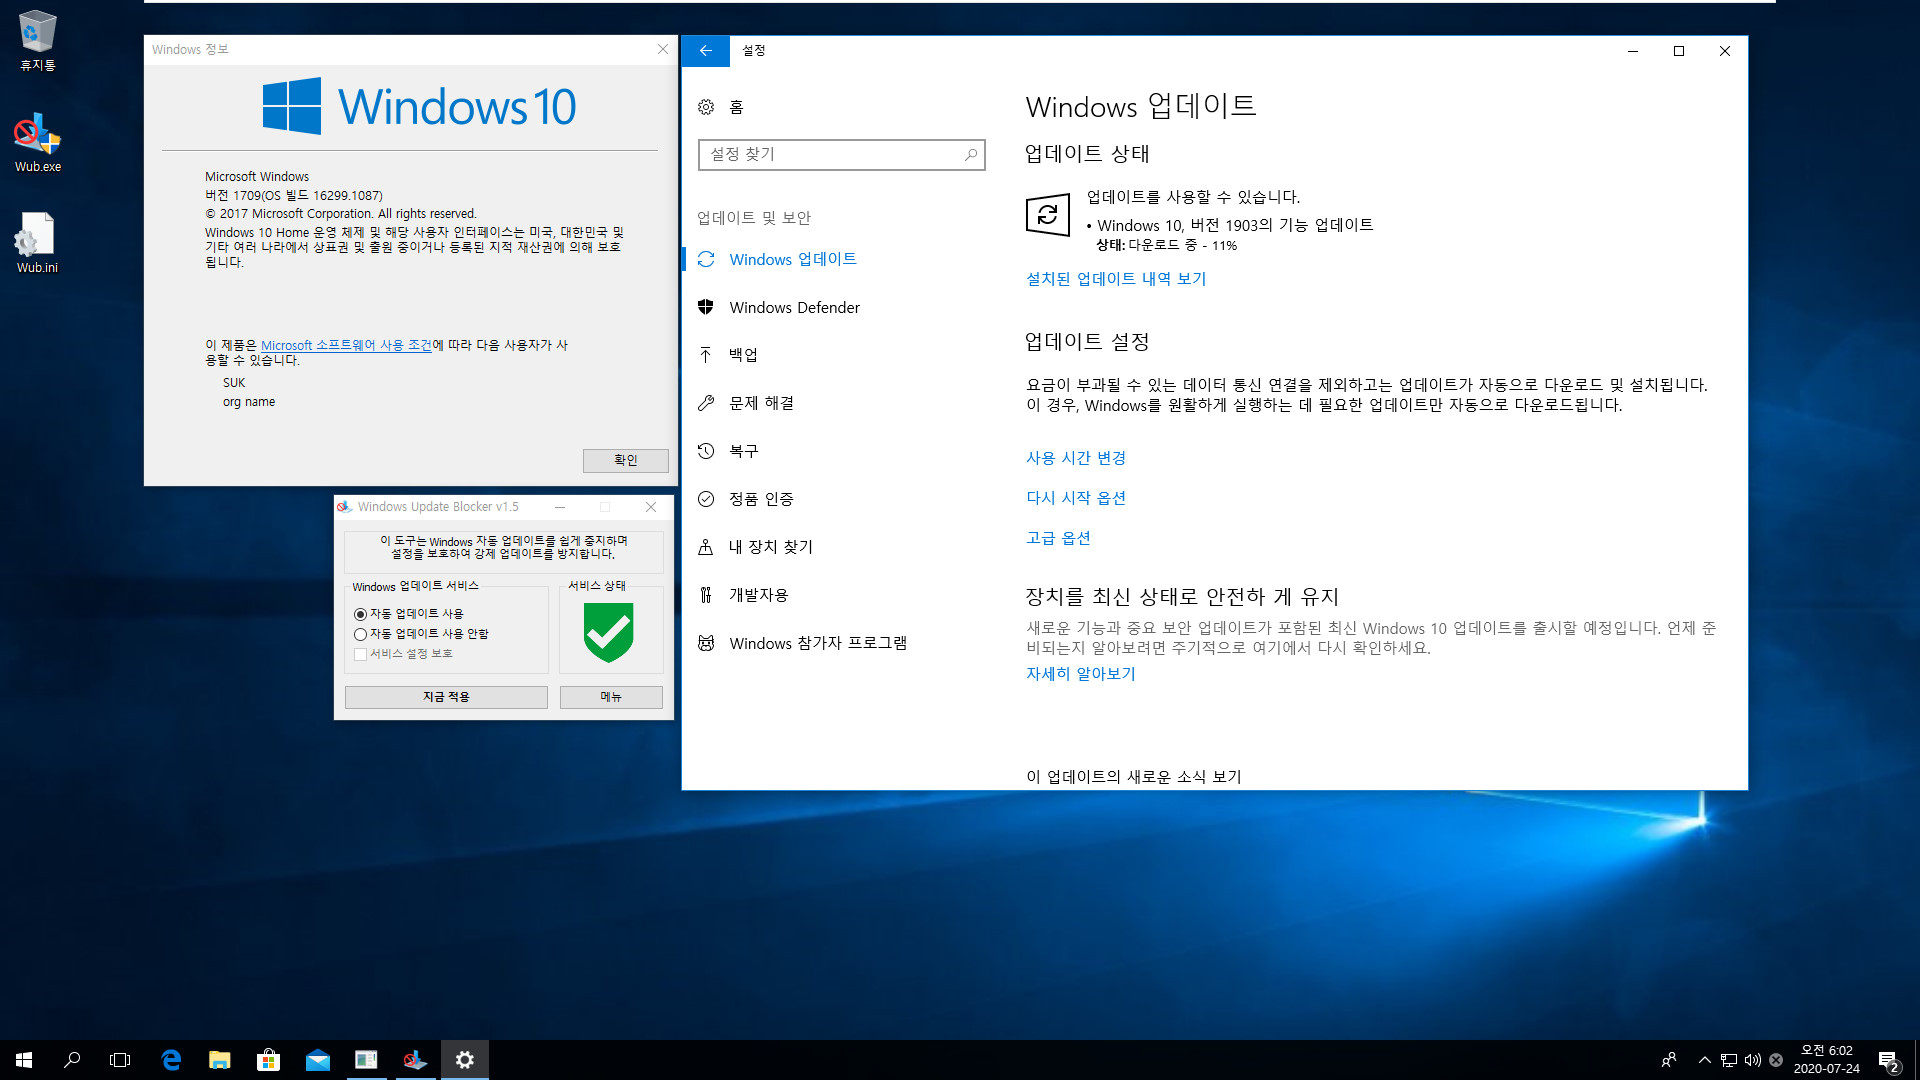 Windows Update Blocker v1.5 업데이트 방지 테스트 - 윈도우는 버전 1709으로 현재 강제 업데이트 중인 버전이고 홈 에디션 2020-07-24_060236.jpg